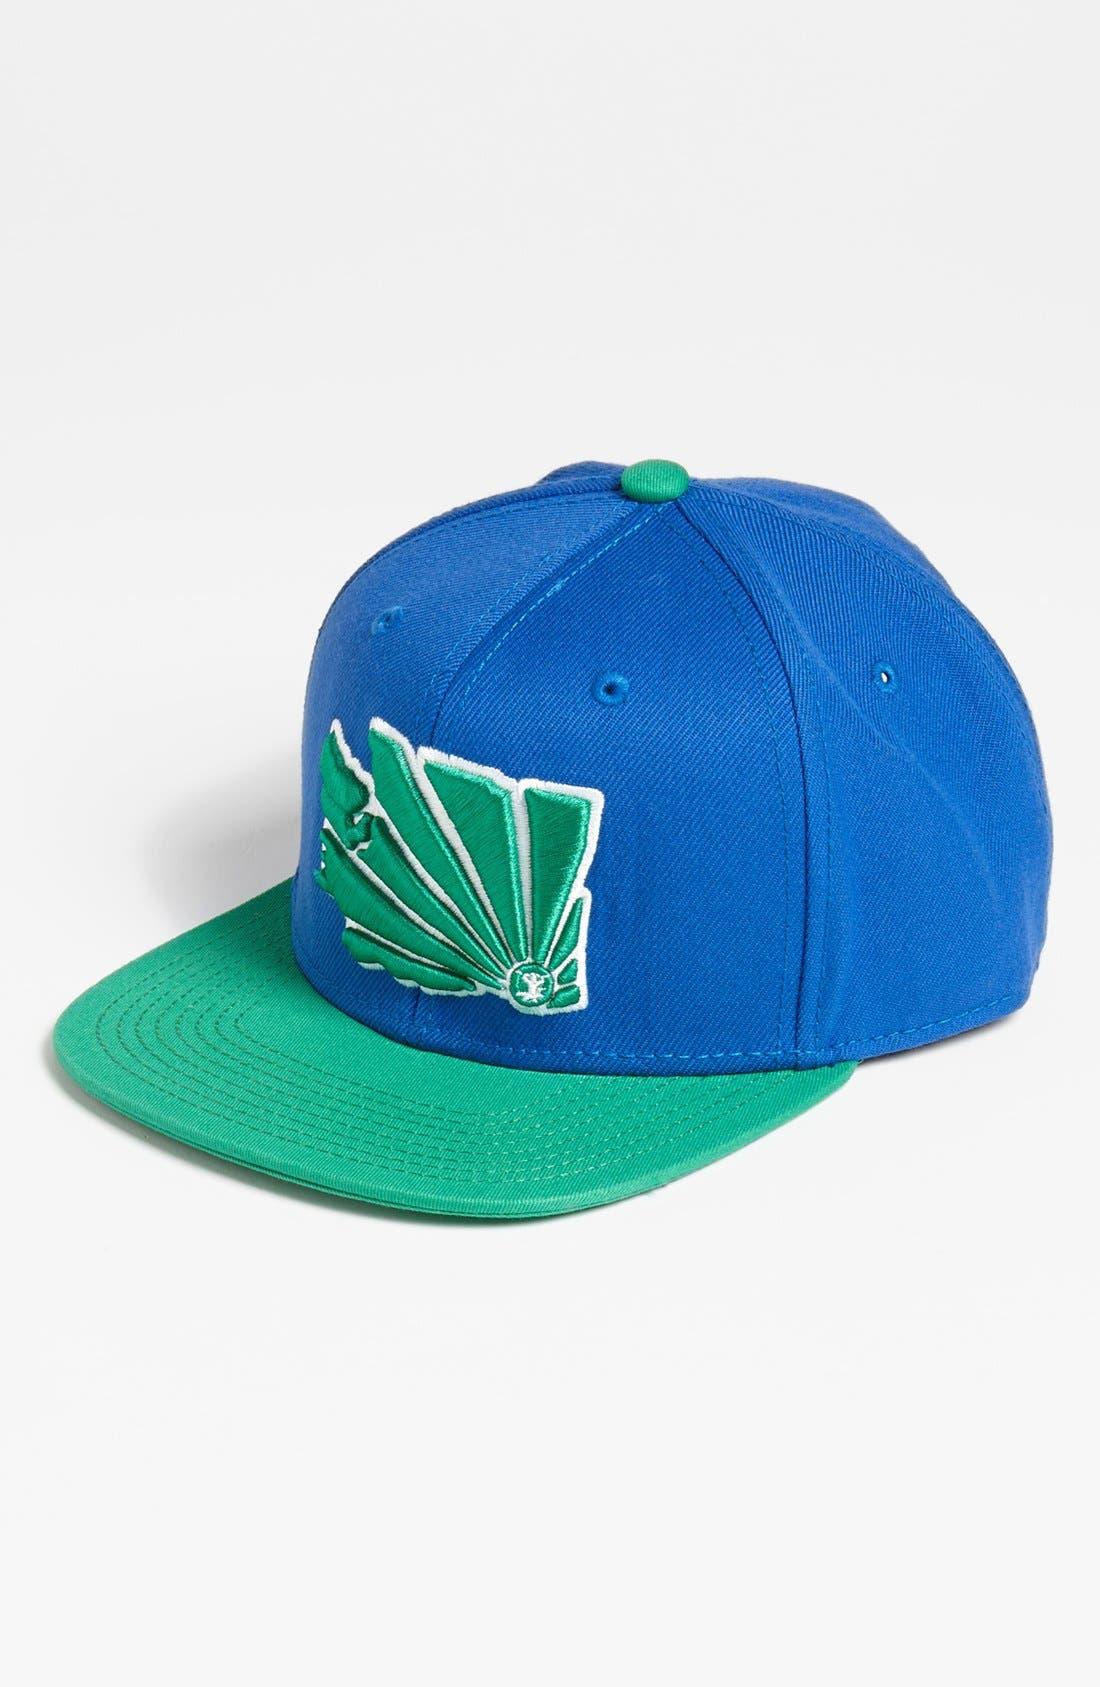 Alternate Image 1 Selected - Casual Industrees 'WA Brah' Snapback Baseball Cap